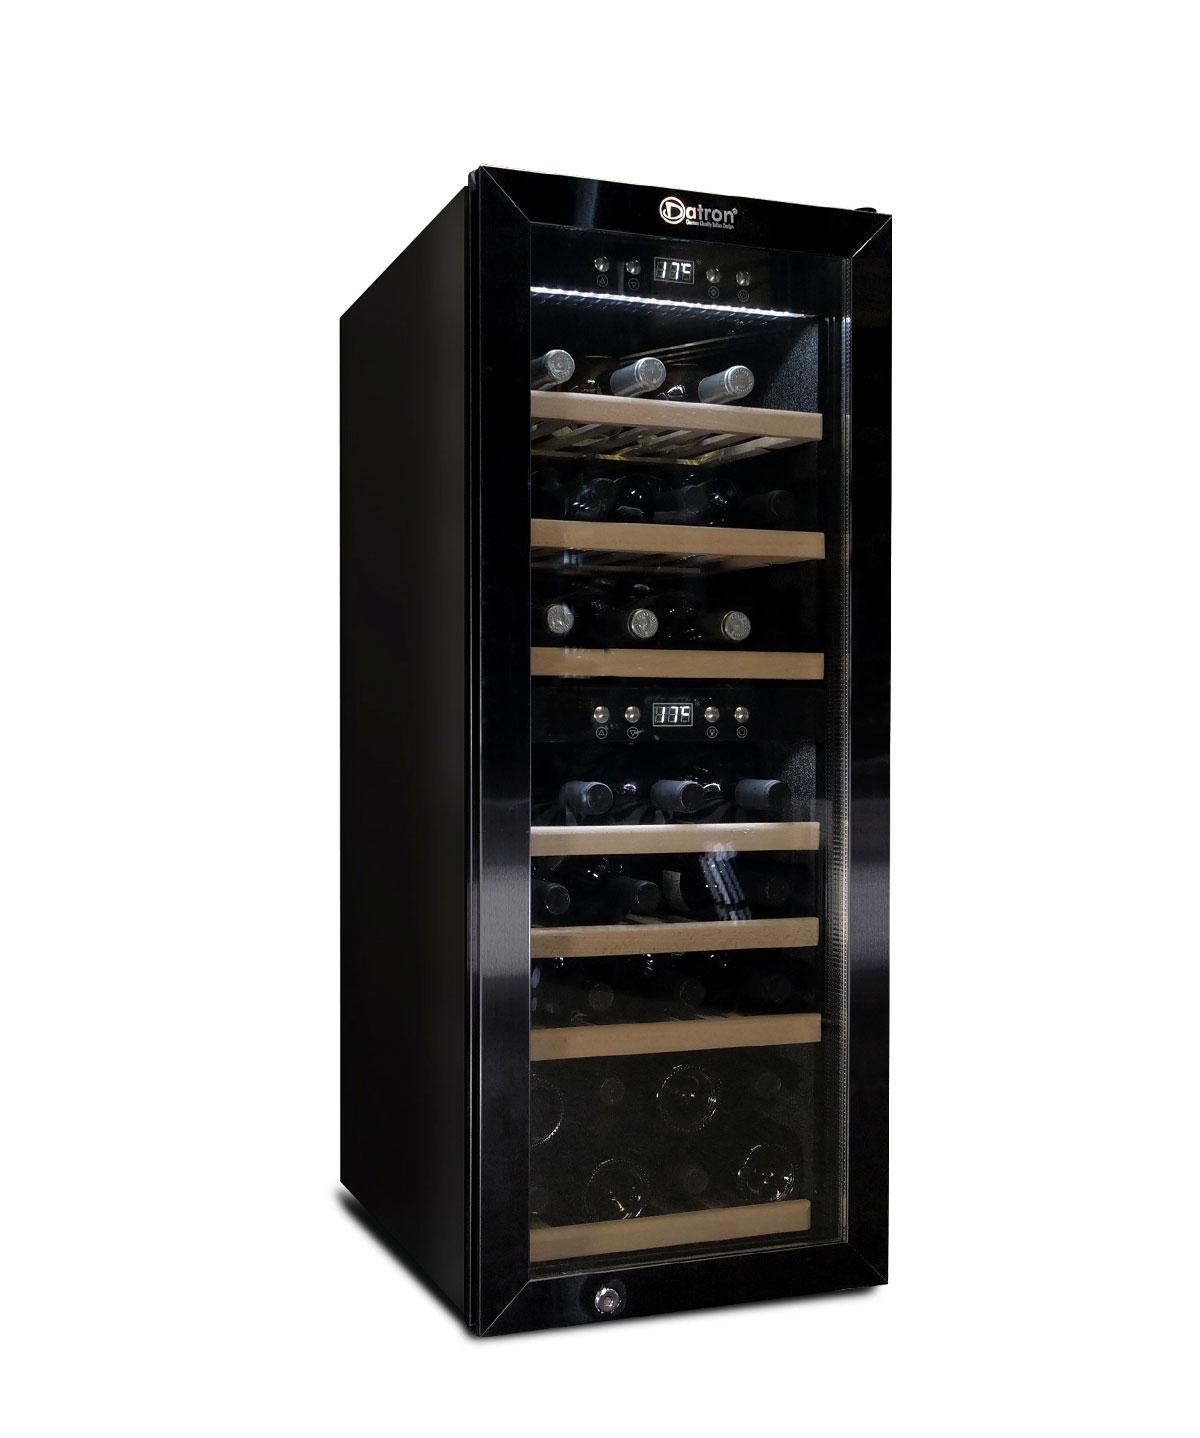 Dual Zone Wine cooler 38 bottles, black